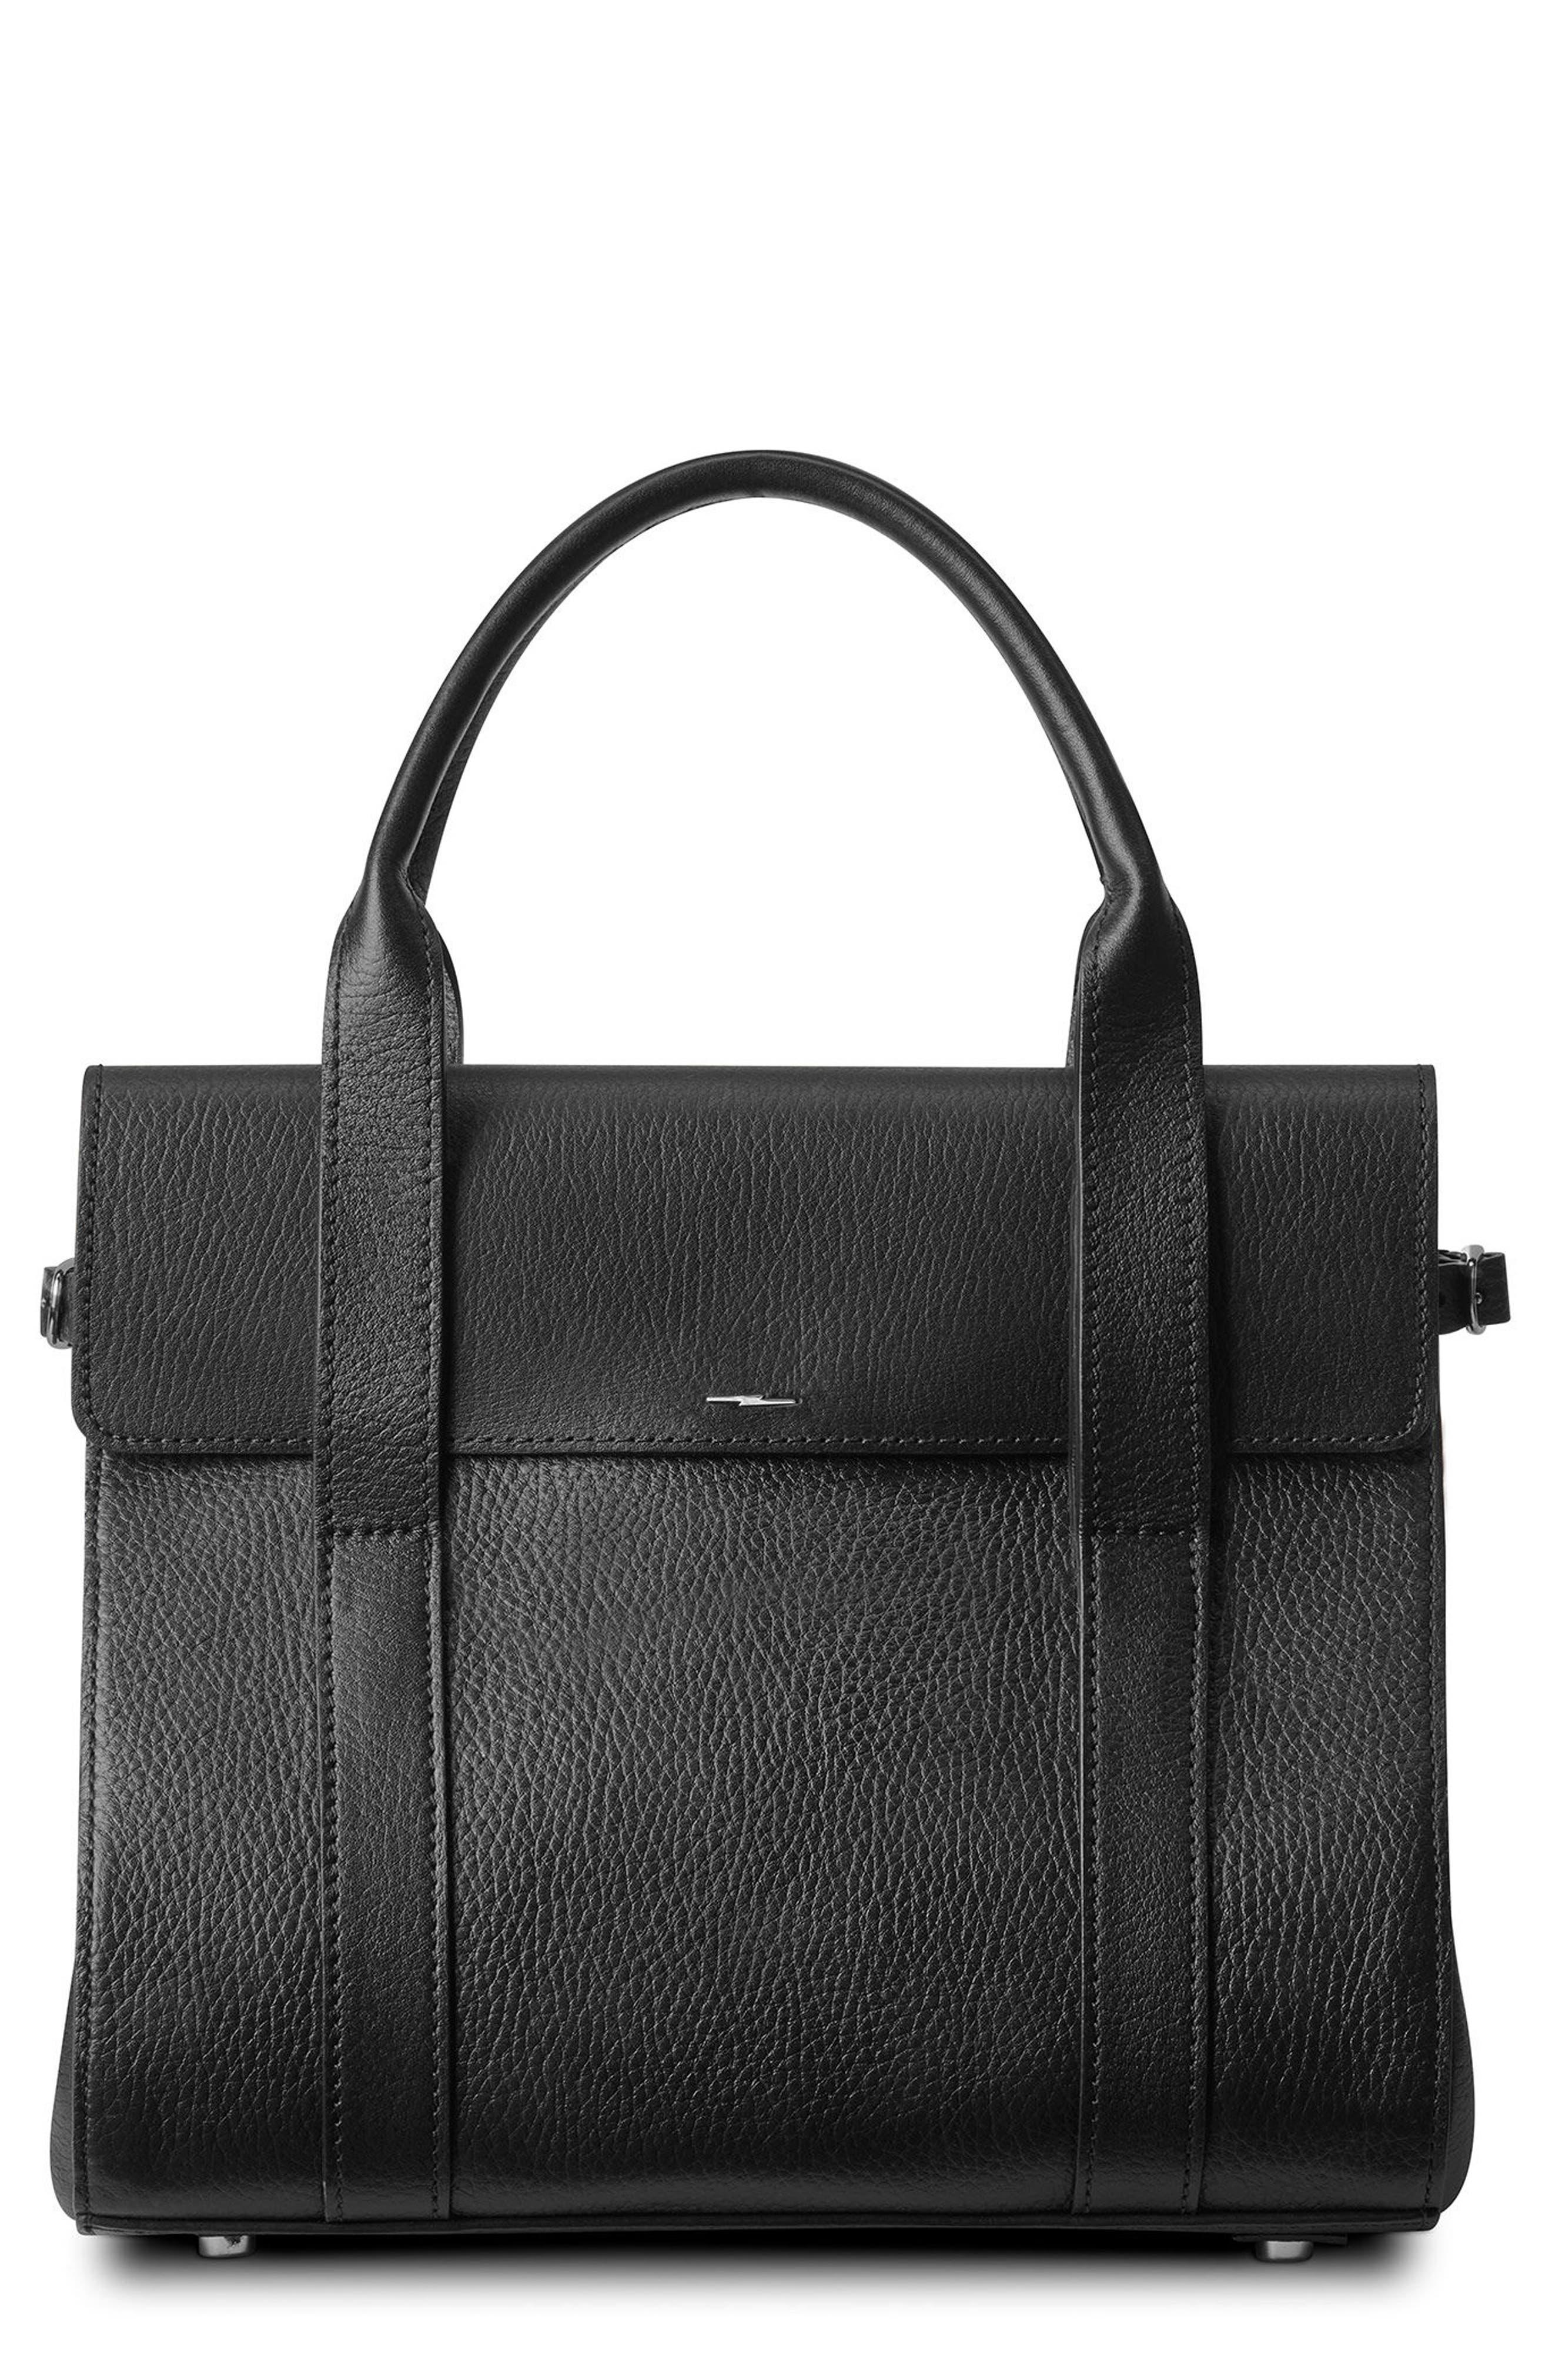 Shinola Small Grained Leather Satchel